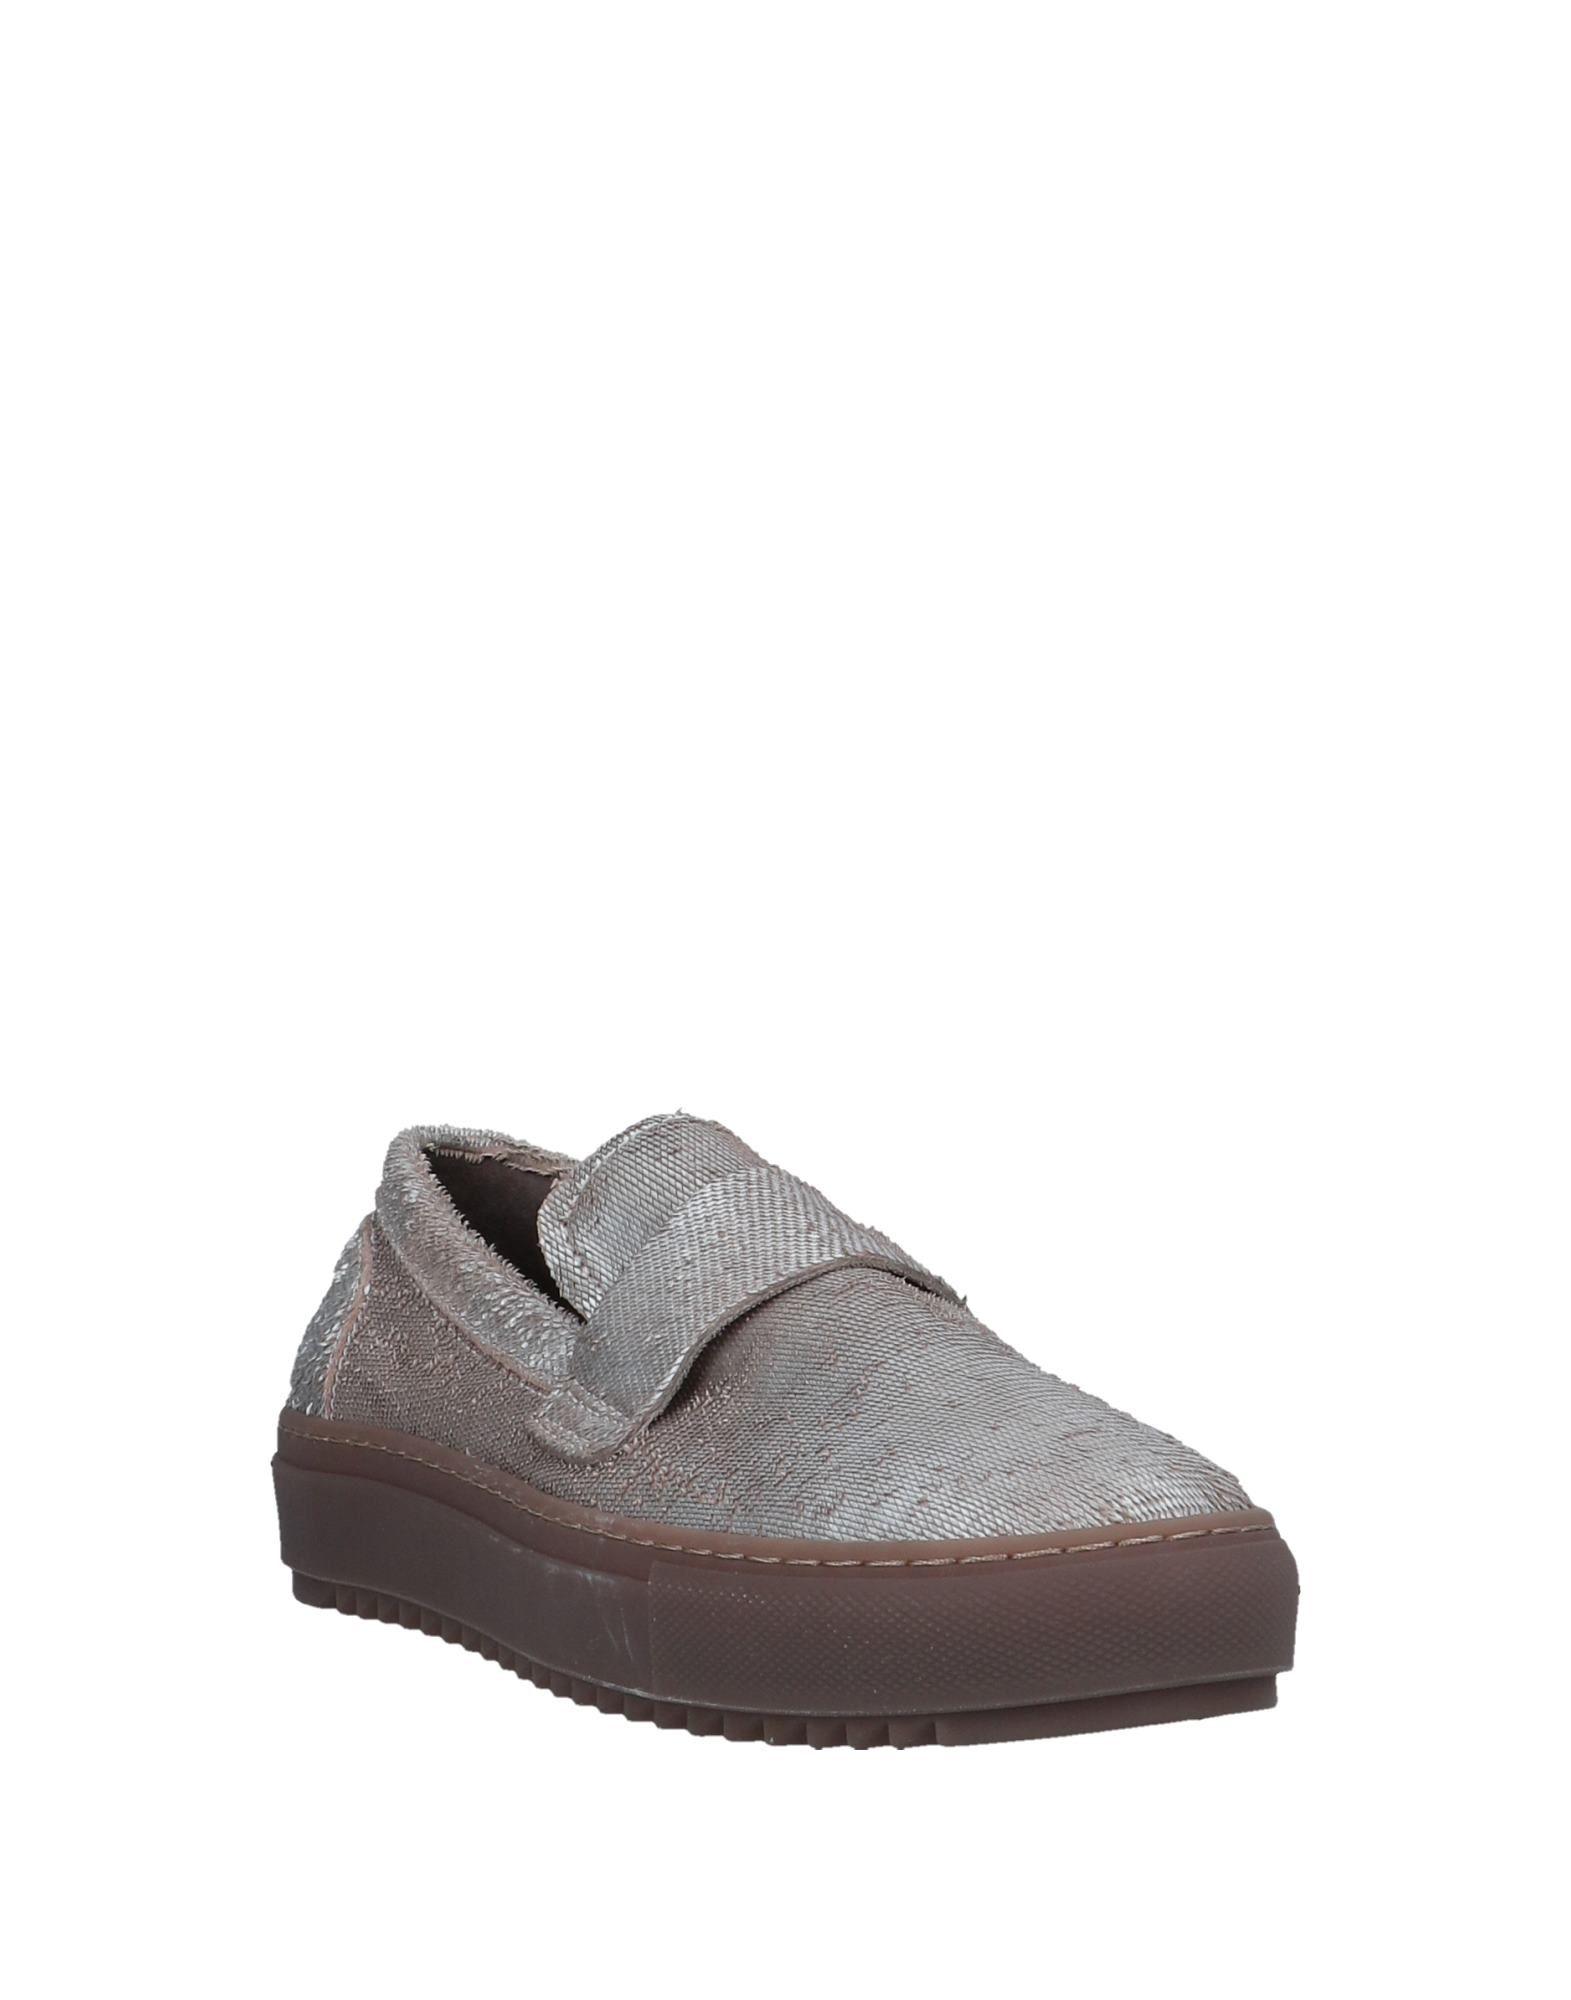 Stilvolle Stilvolle Stilvolle billige Schuhe Agl Attilio Giusti Leombruni Mokassins Damen  11539937MQ 9f21ba